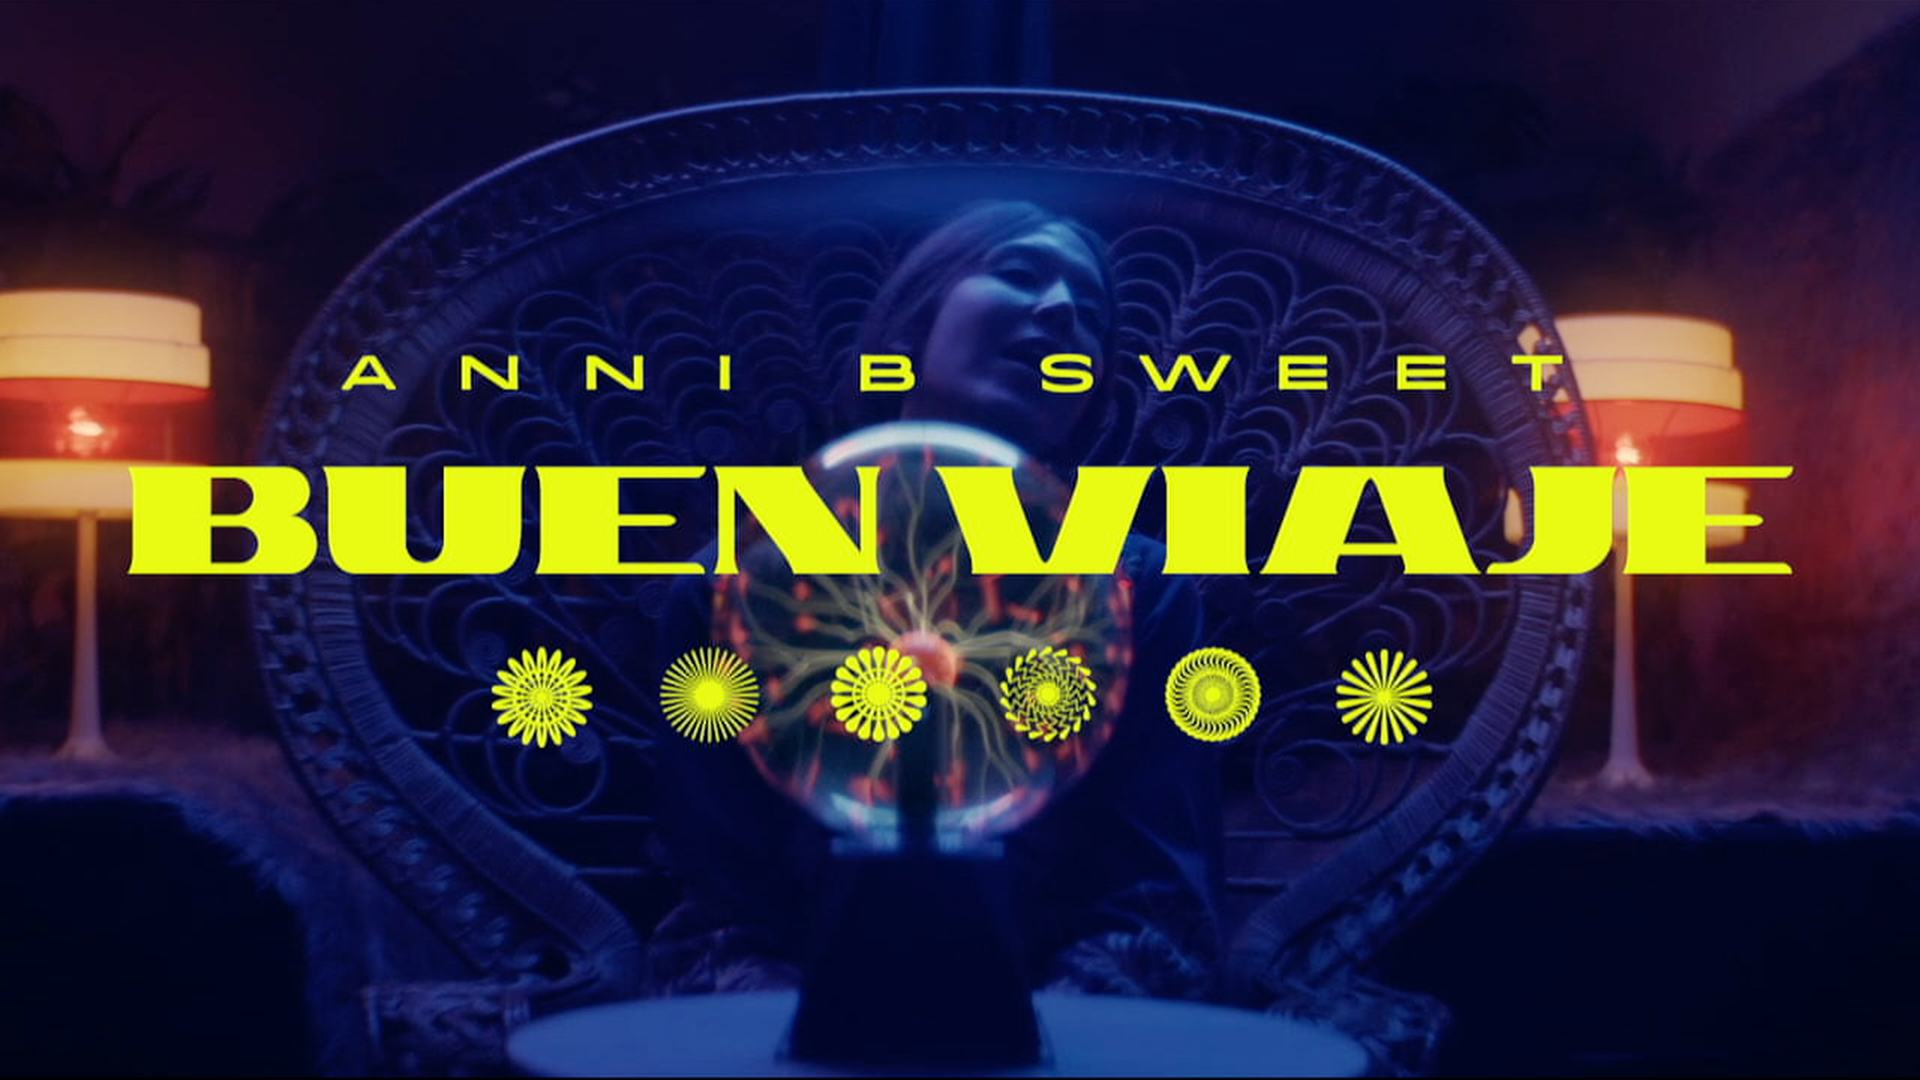 MUSIC VIDEO / BUEN VIAJE : ANNI B SWEET